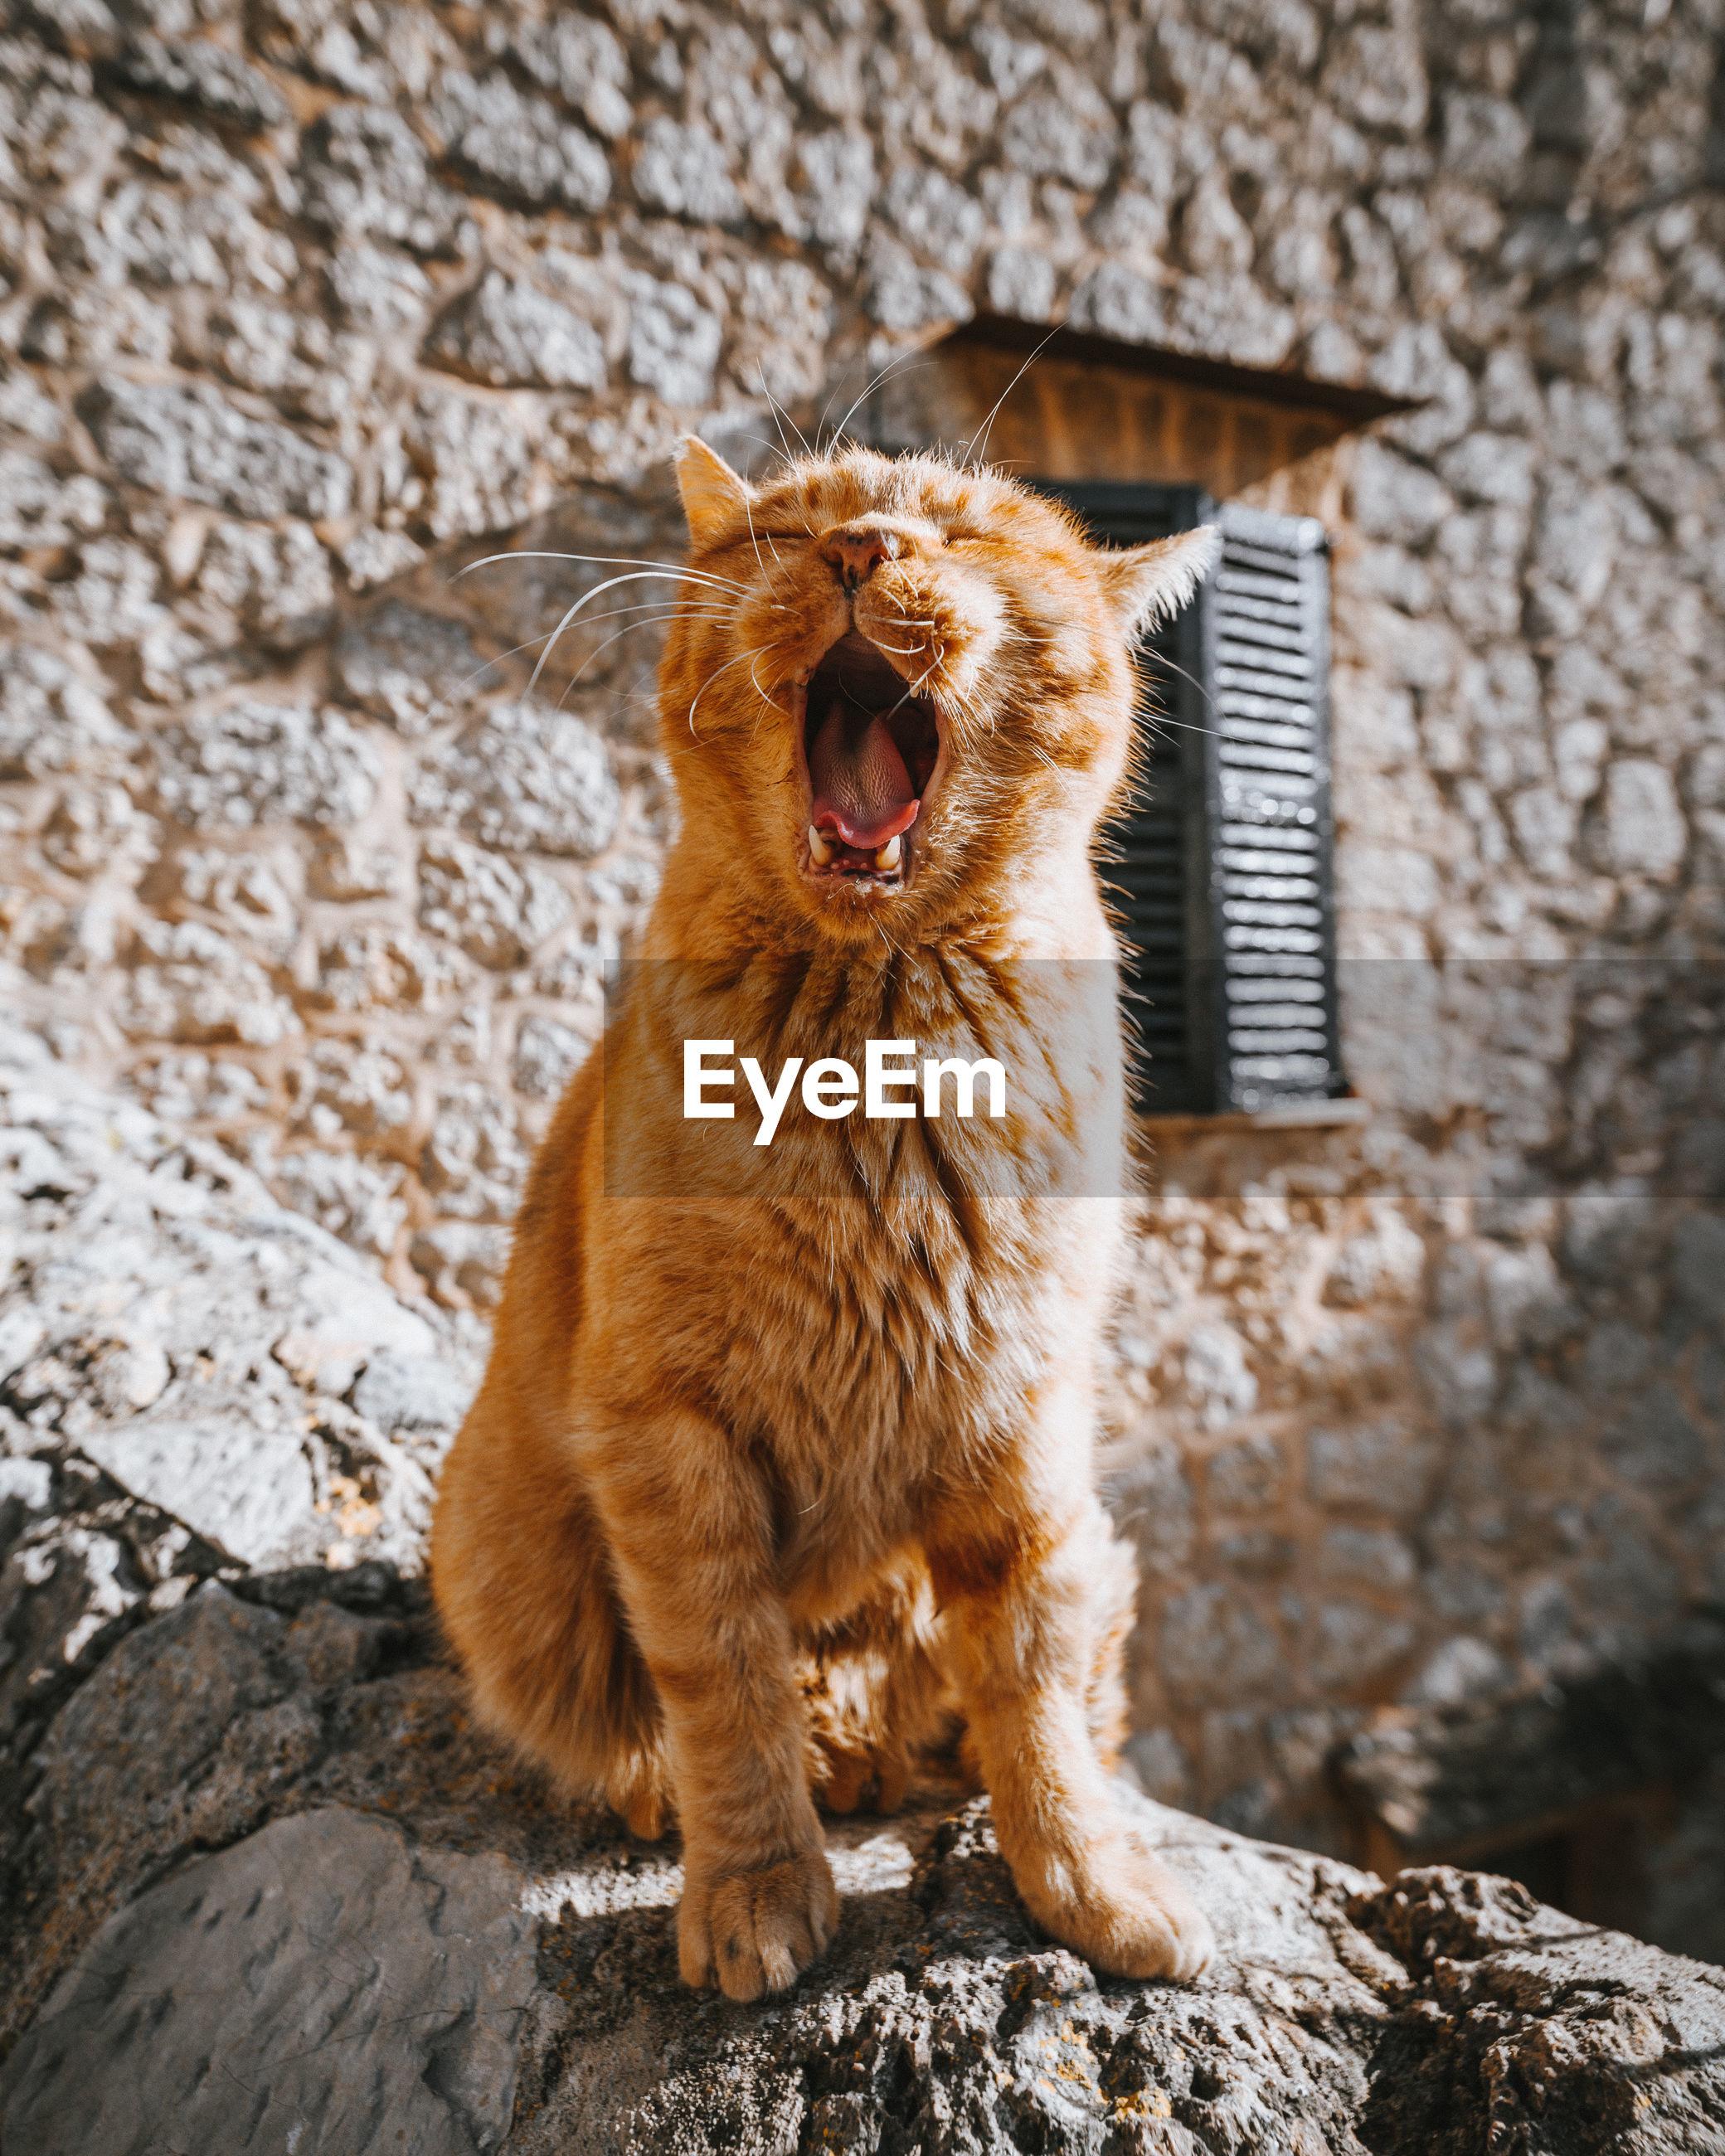 Cat yawning while sitting on rock